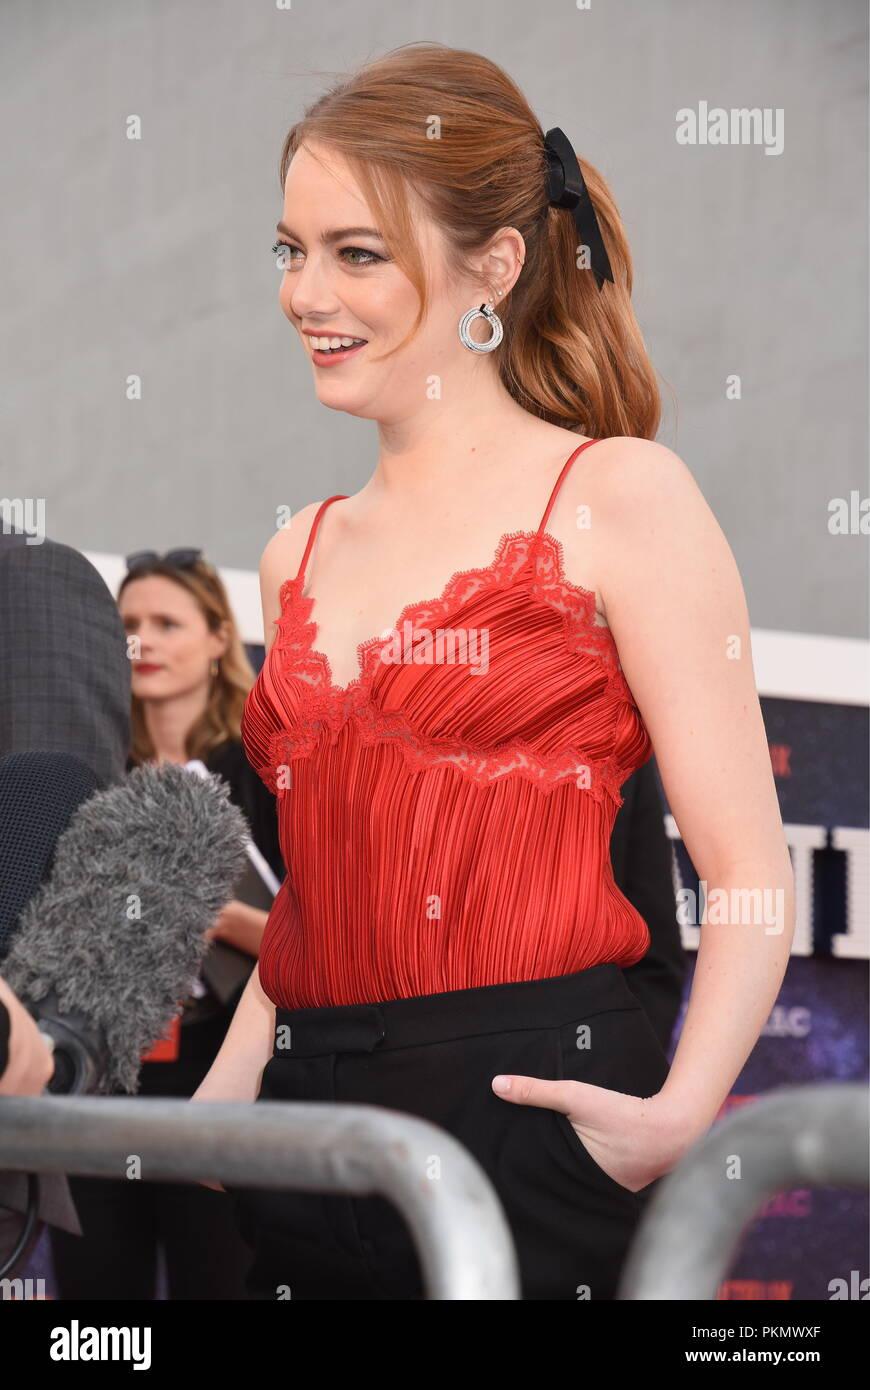 London, UK. 13th September 2018. Emma Stone,'Maniac' NetflixTV Premiere,Queen Elizabeth Hall,Southbank,London.UK Credit: michael melia/Alamy Live News - Stock Image